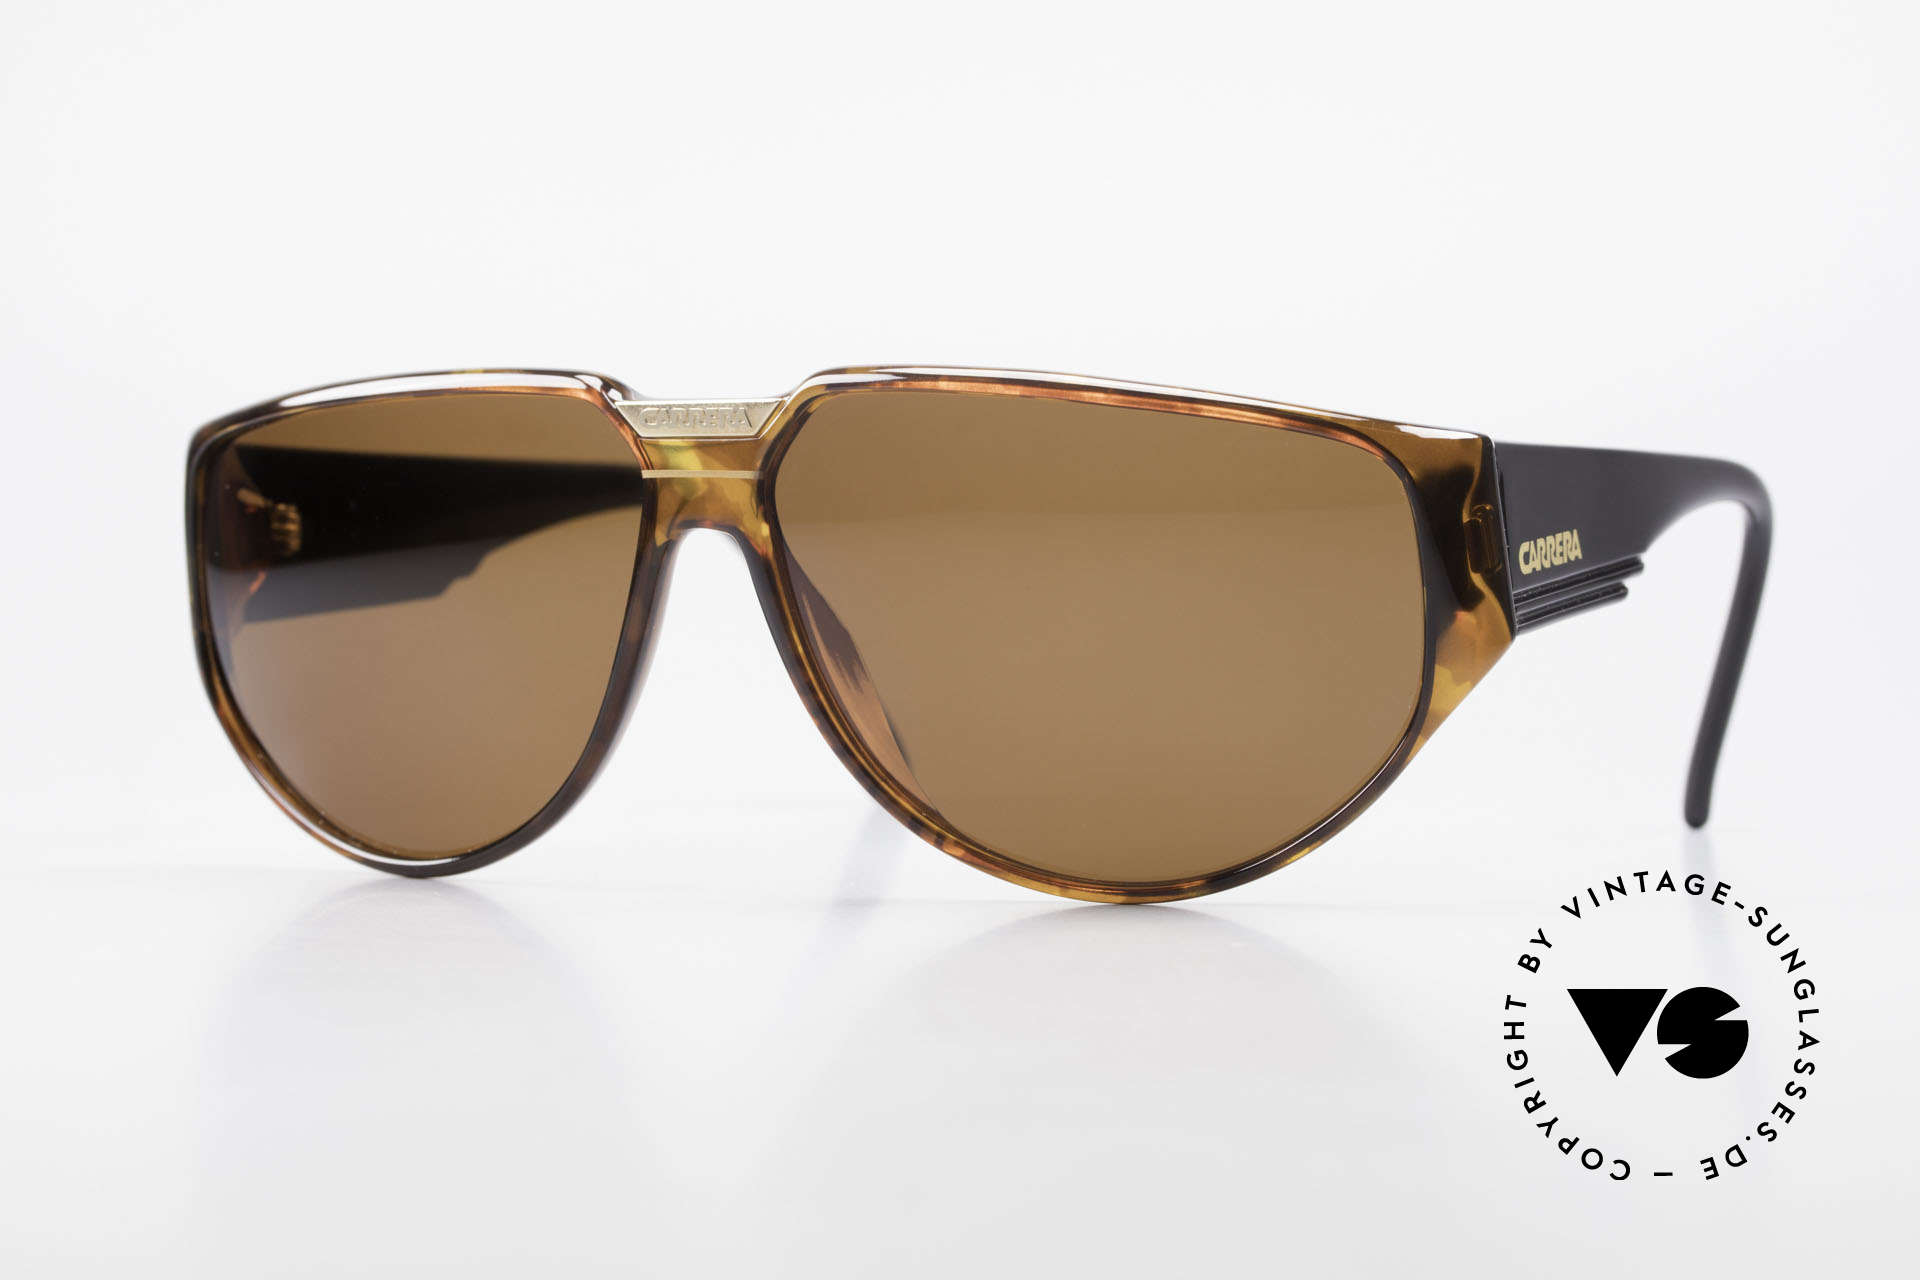 Carrera 5417 Rare 80's Sportsglasses Optyl, old, original Carrera sports sunglasses from 1989, Made for Men